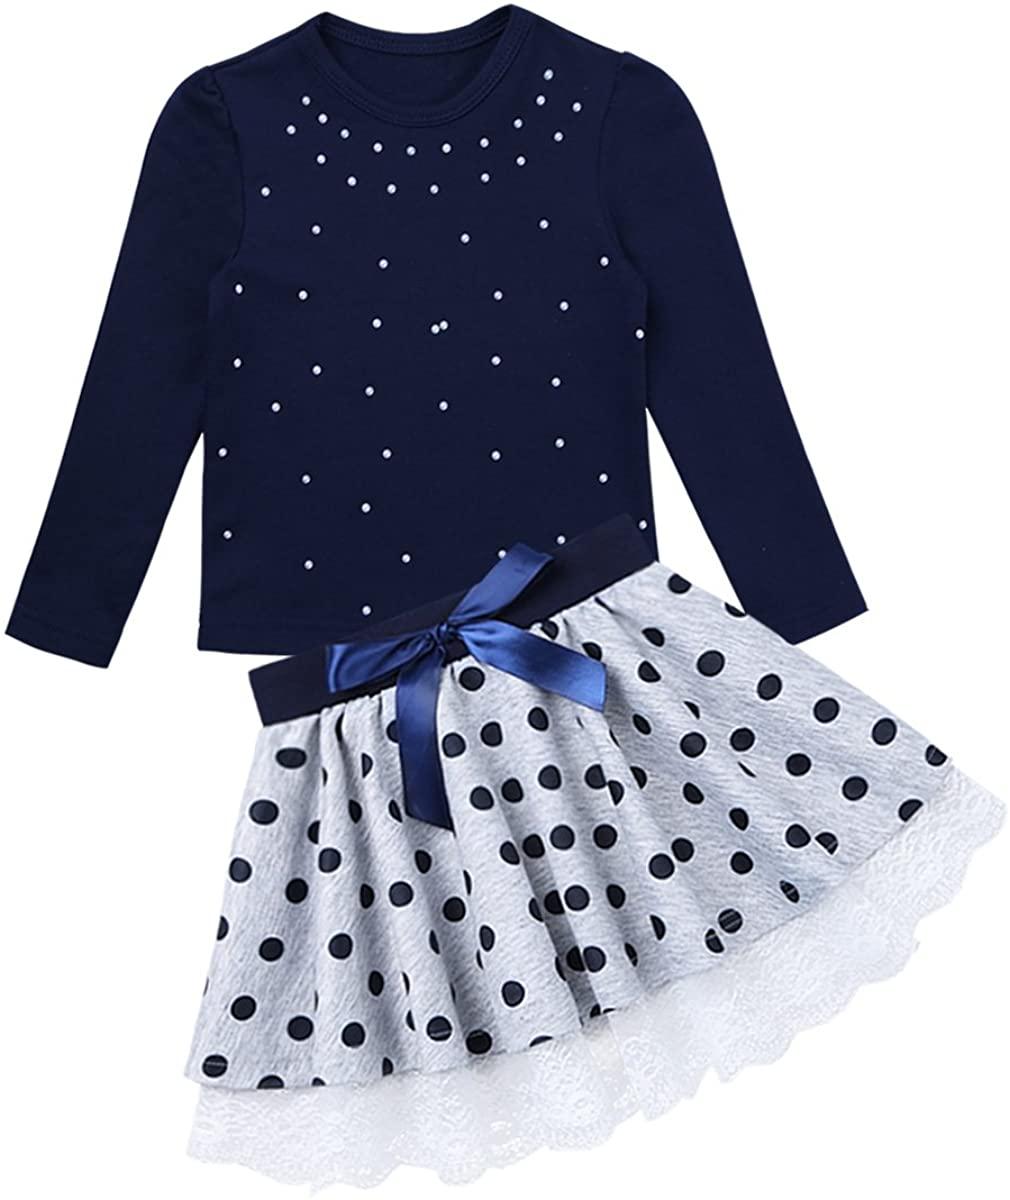 Freebily Kids Girl Cute 2PCS Skirt Clothing Set Long Sleeve Top +Polka Dot Tutu Skirt Playwear